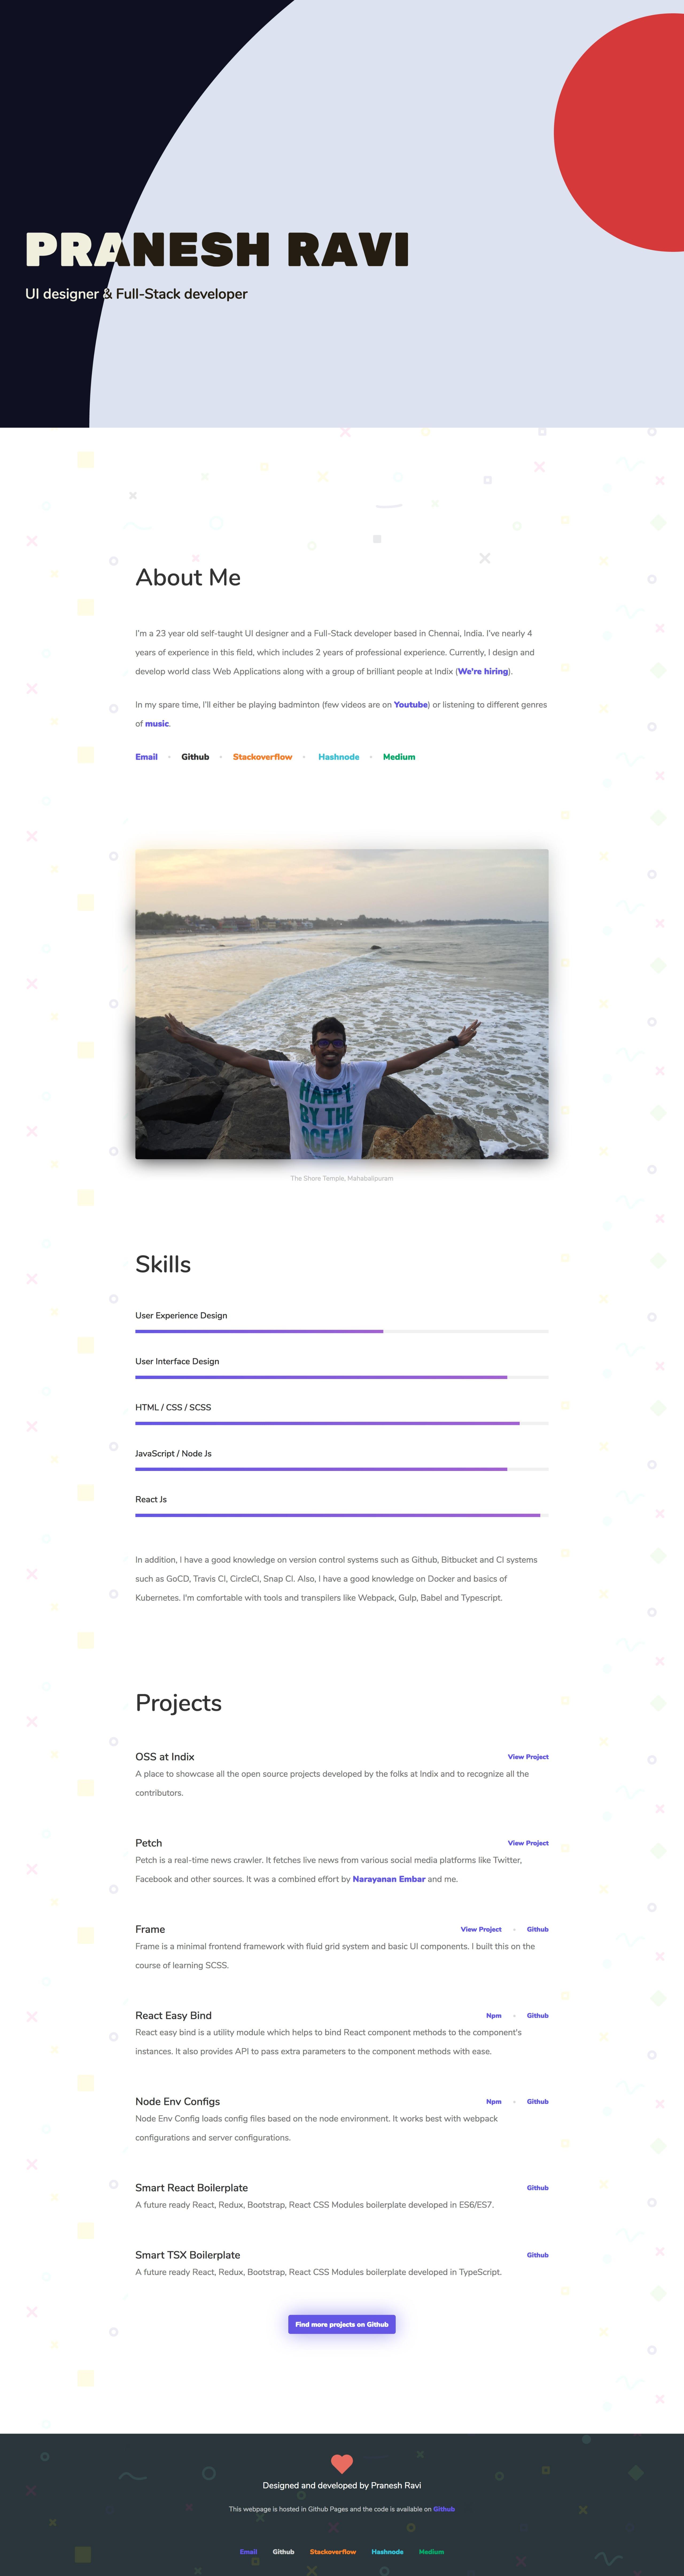 Pranesh Ravi Website Screenshot